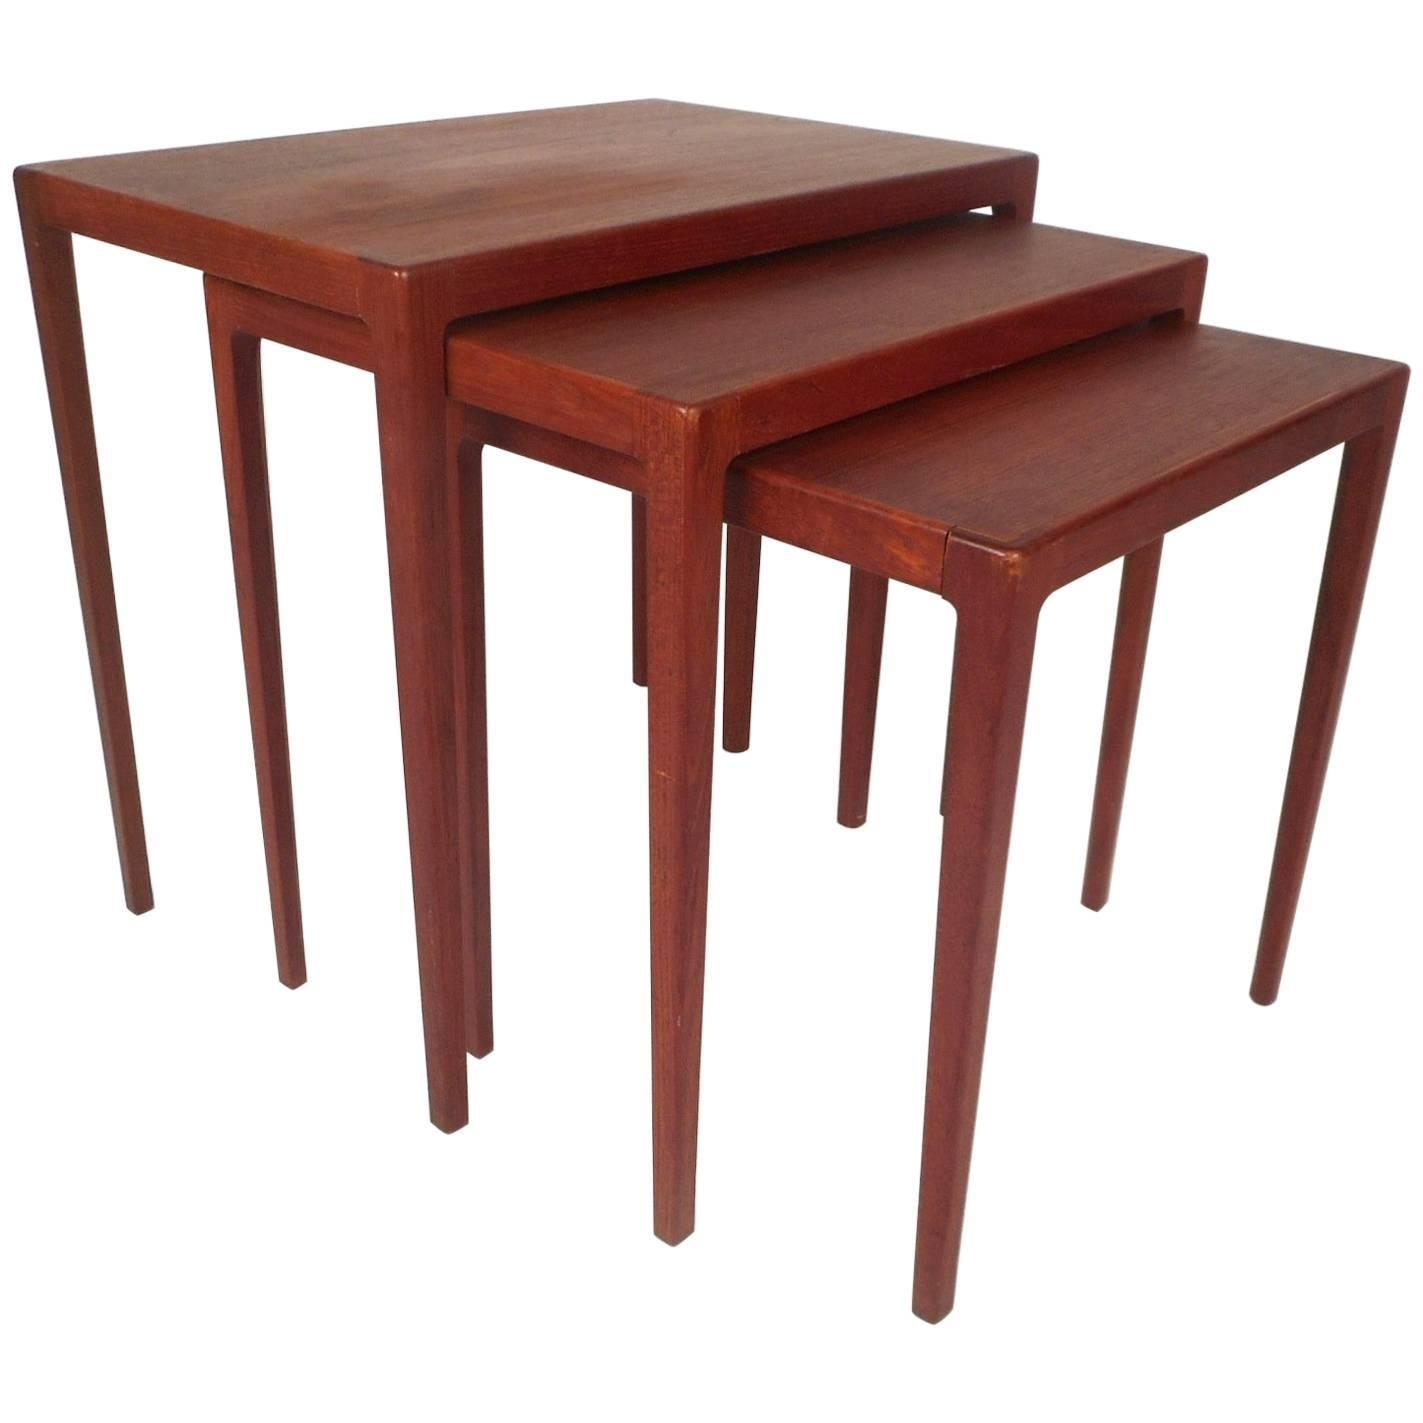 Delightful Set Of Three Mid Century Modern Danish Teak Nesting Tables By Ludvig  Pontoppidan